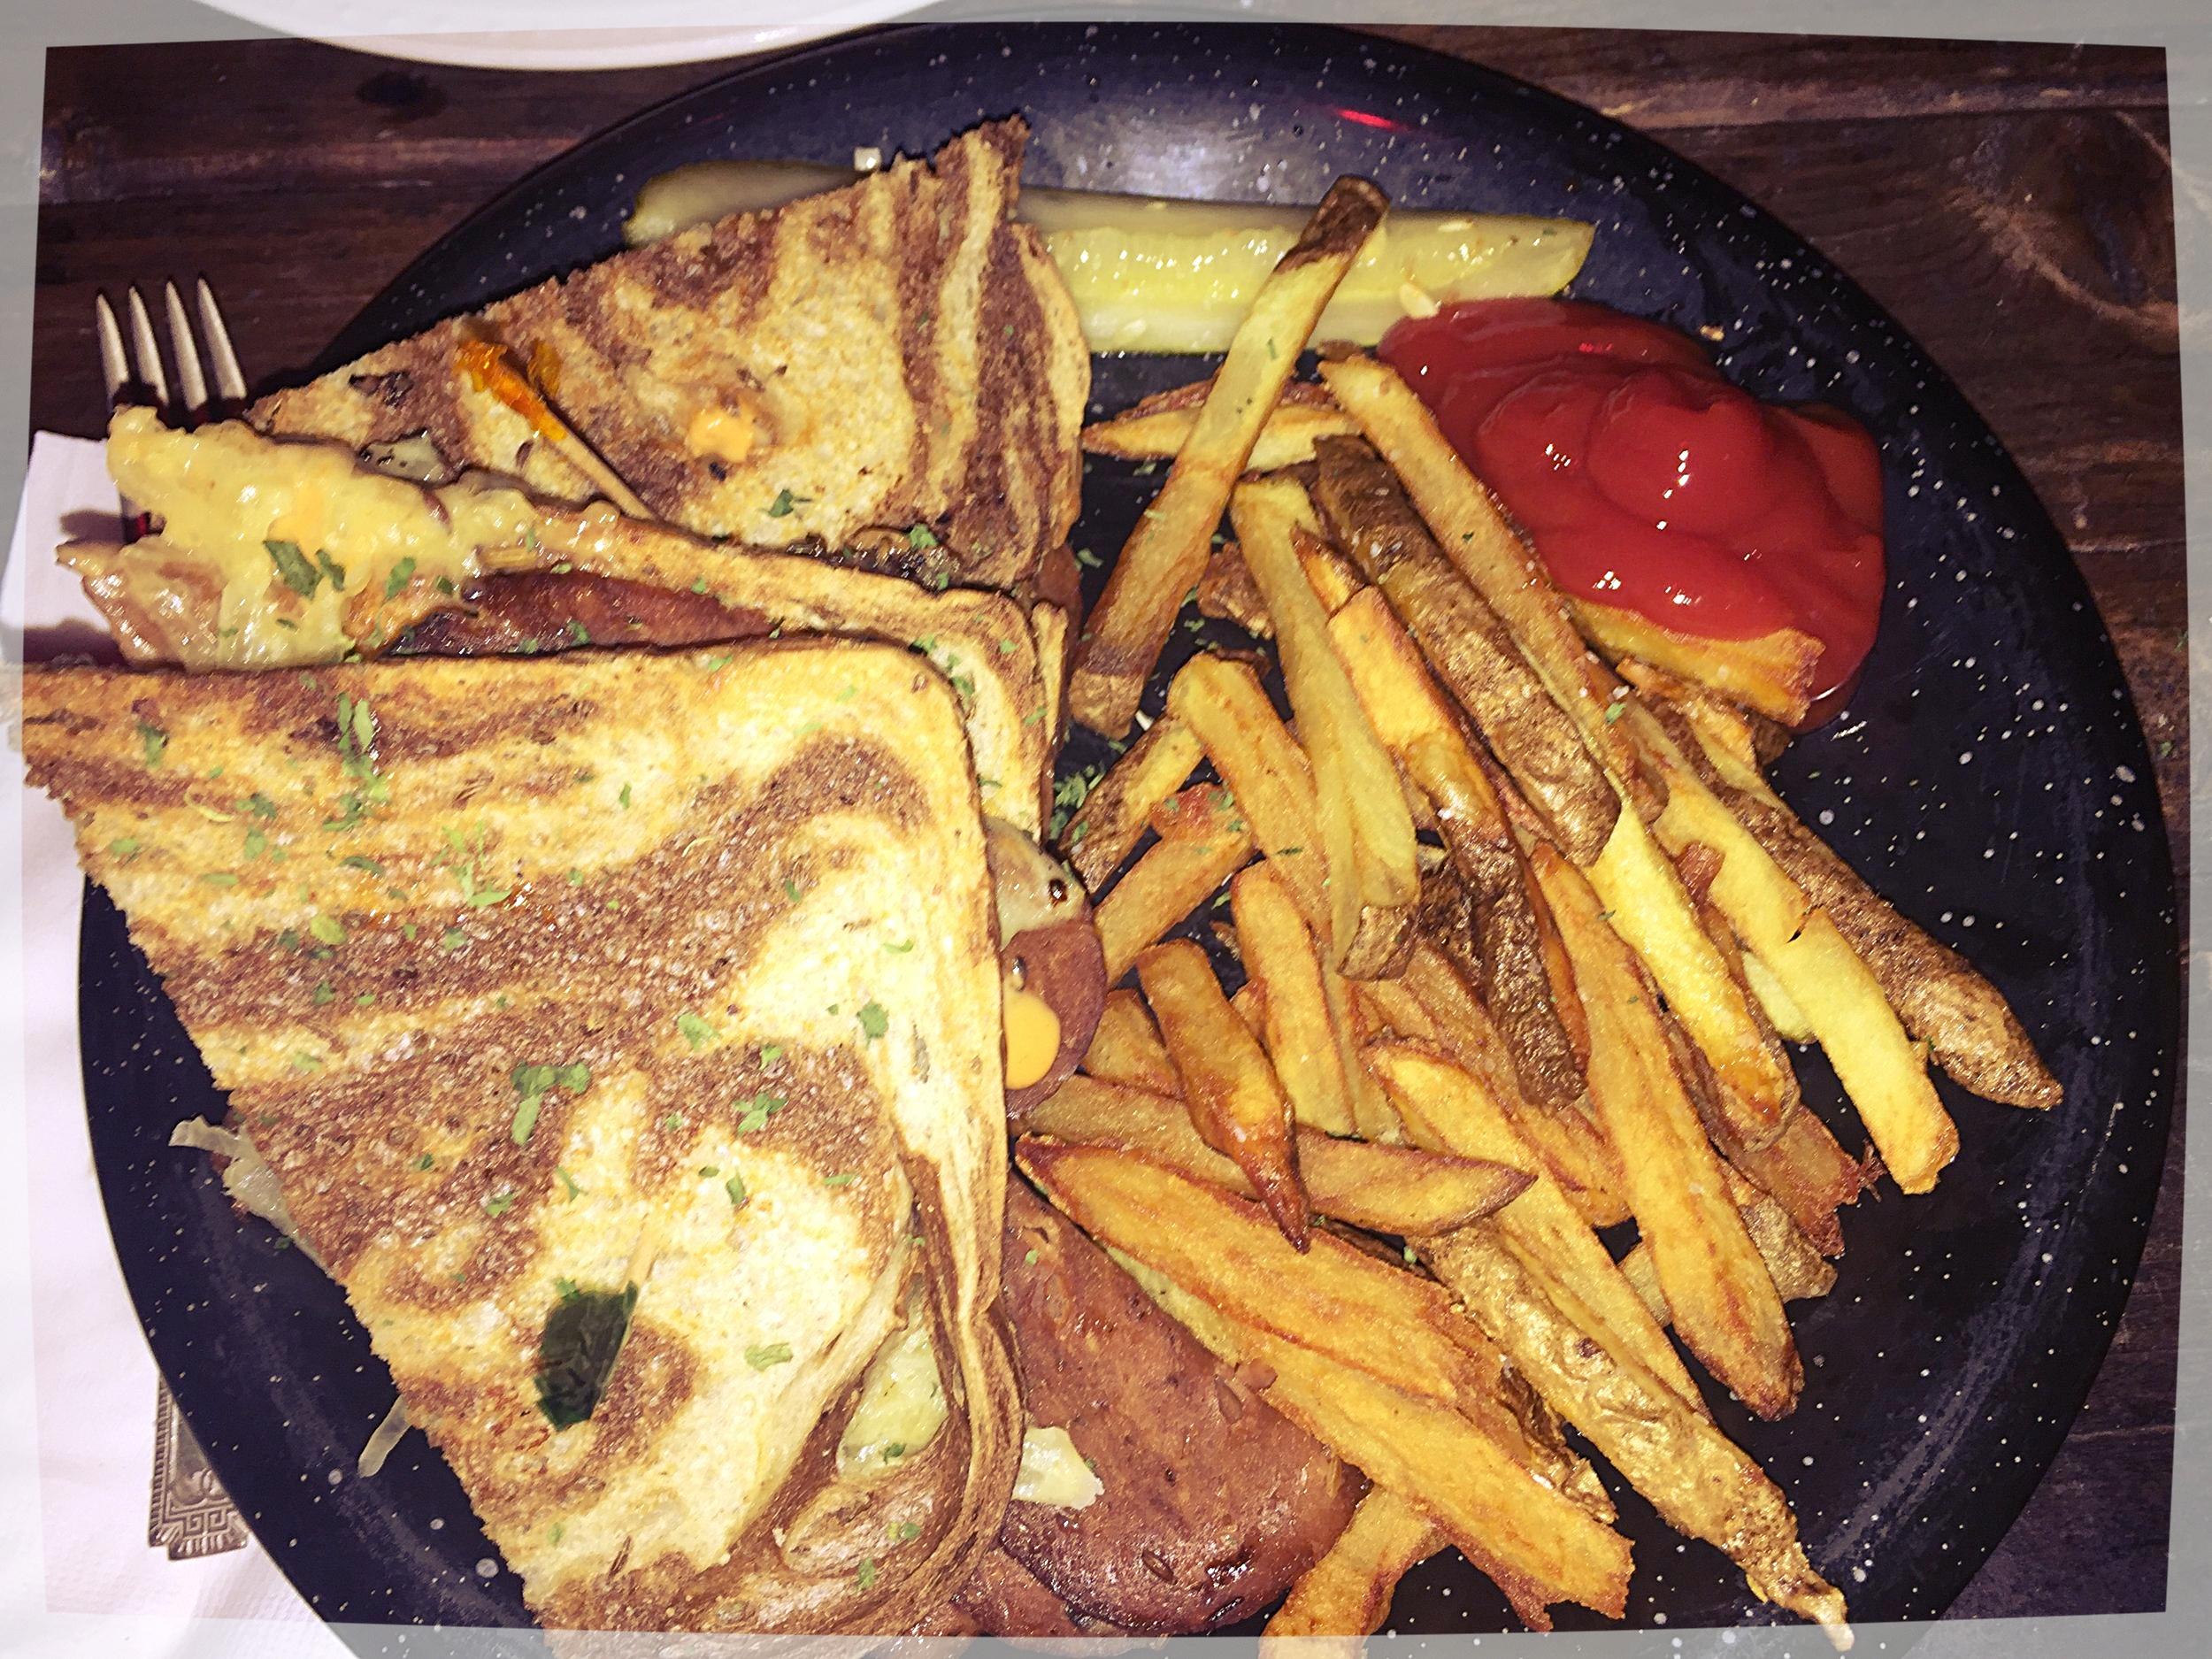 Vegan reuben sandwich from Highline Bar in Seattle, Washington